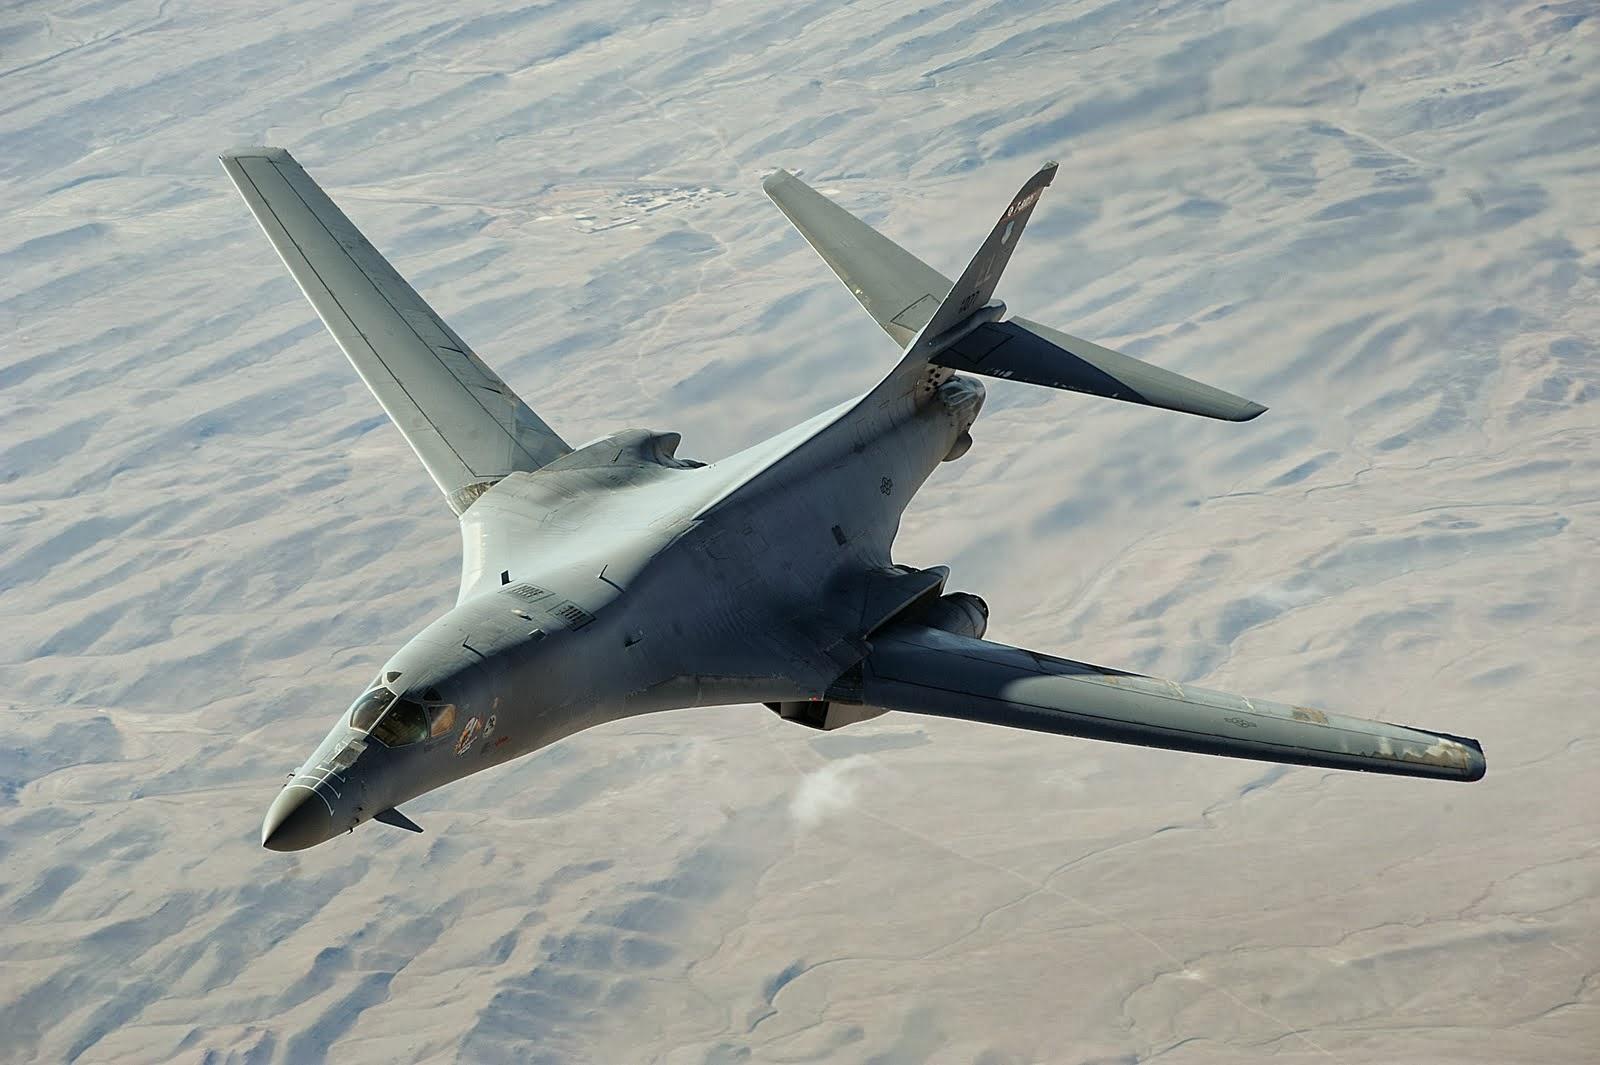 Gambar Pesawat Pembom B-1 Lancer | Fighter Jet Picture and Photos